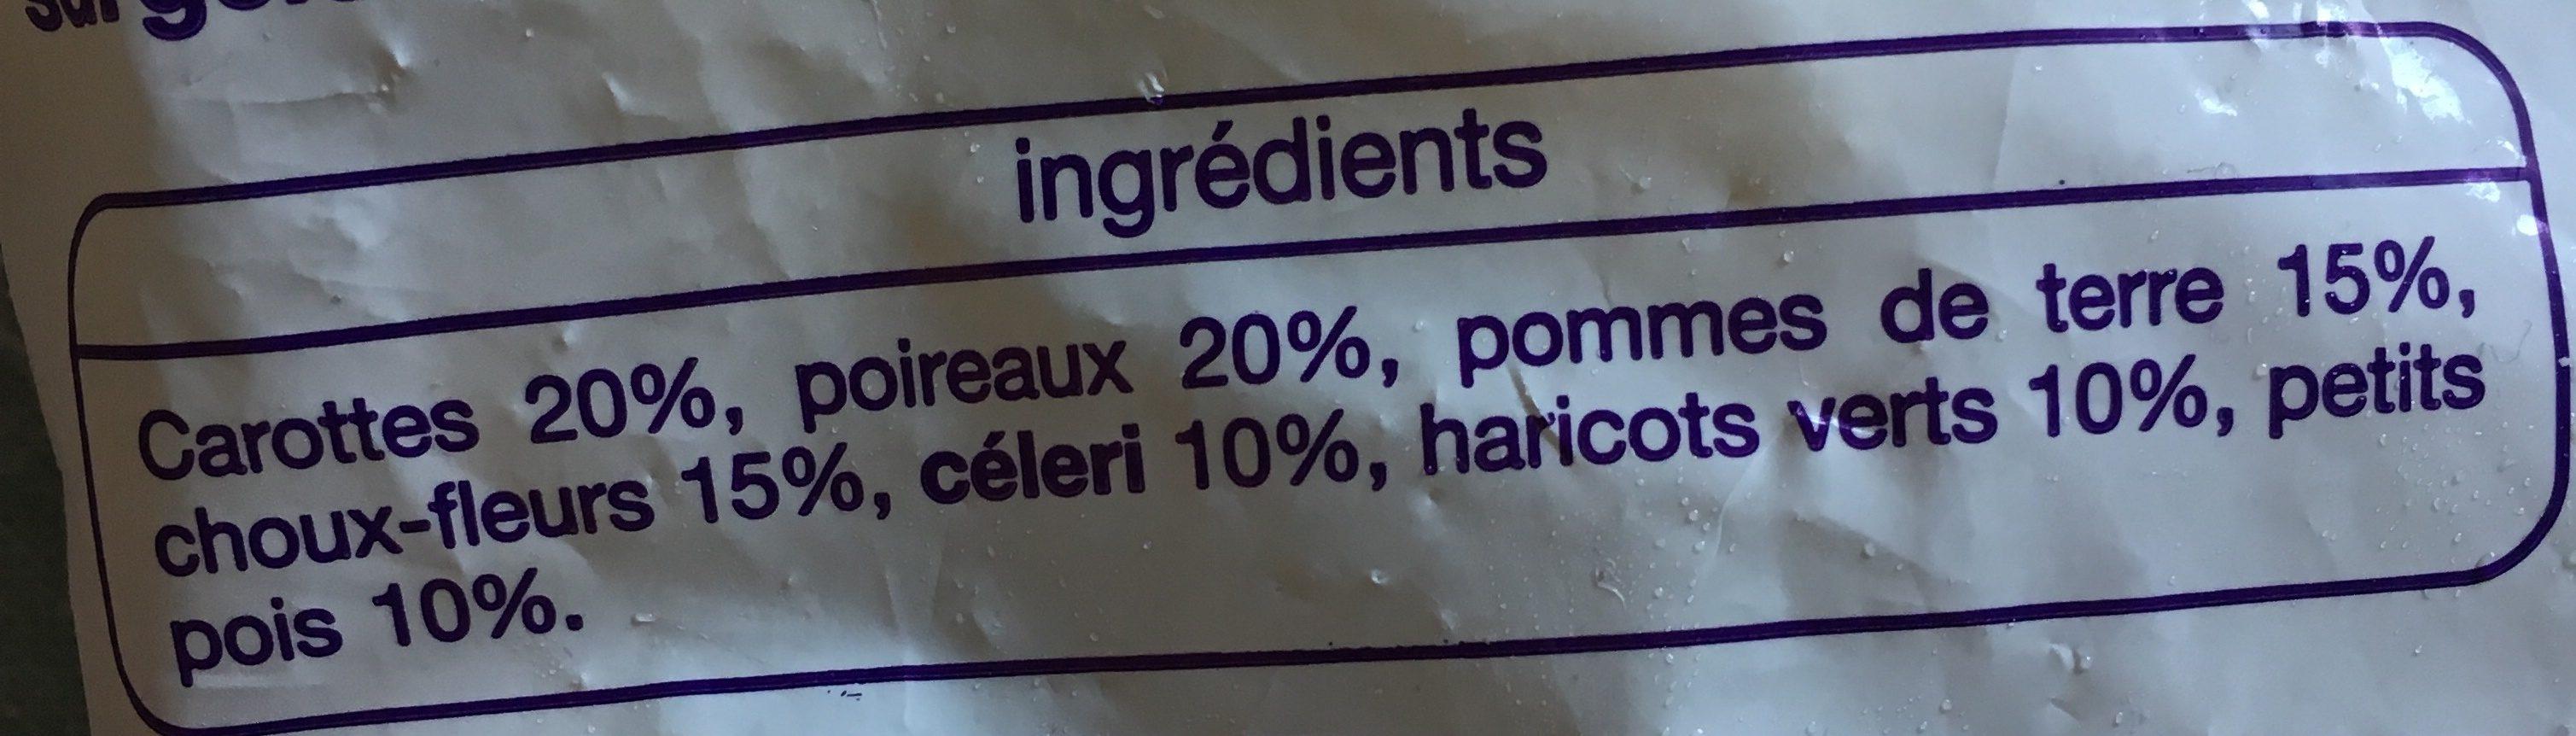 Légumes Potage Auchan - Ingredients